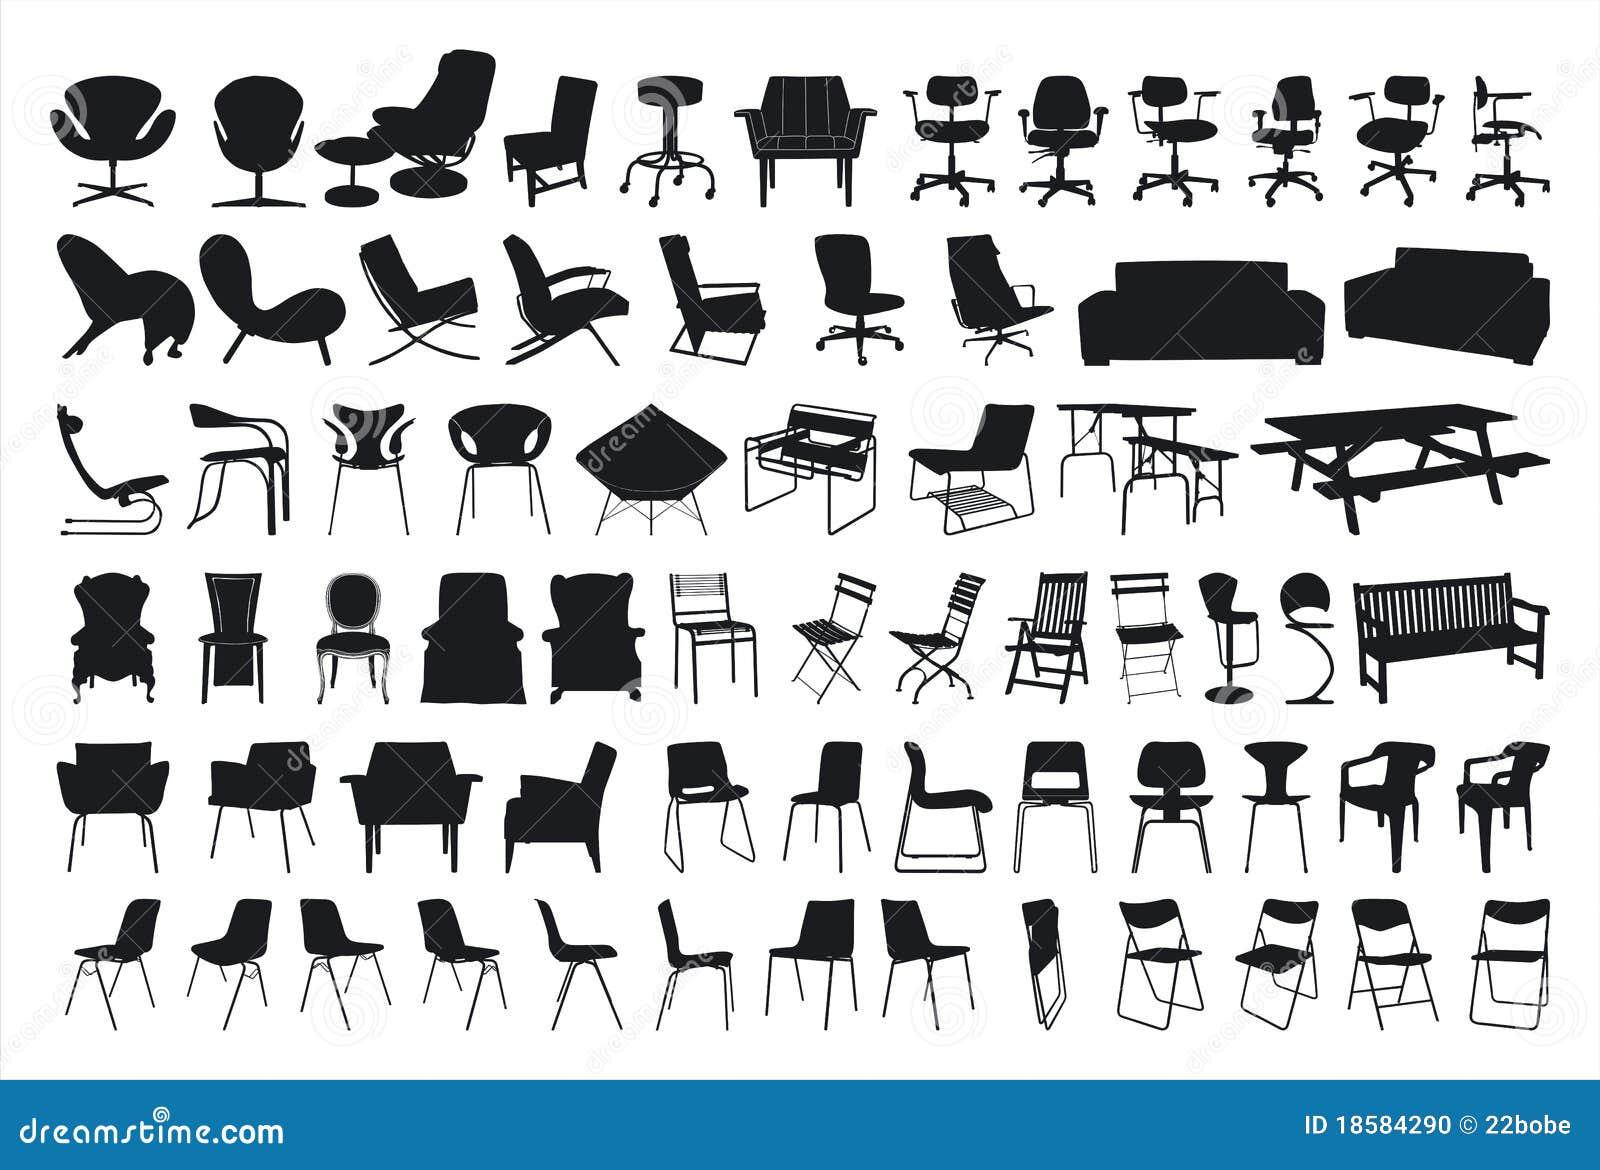 adirondack chair silhouette. Adirondack Chair Silhouette Vector